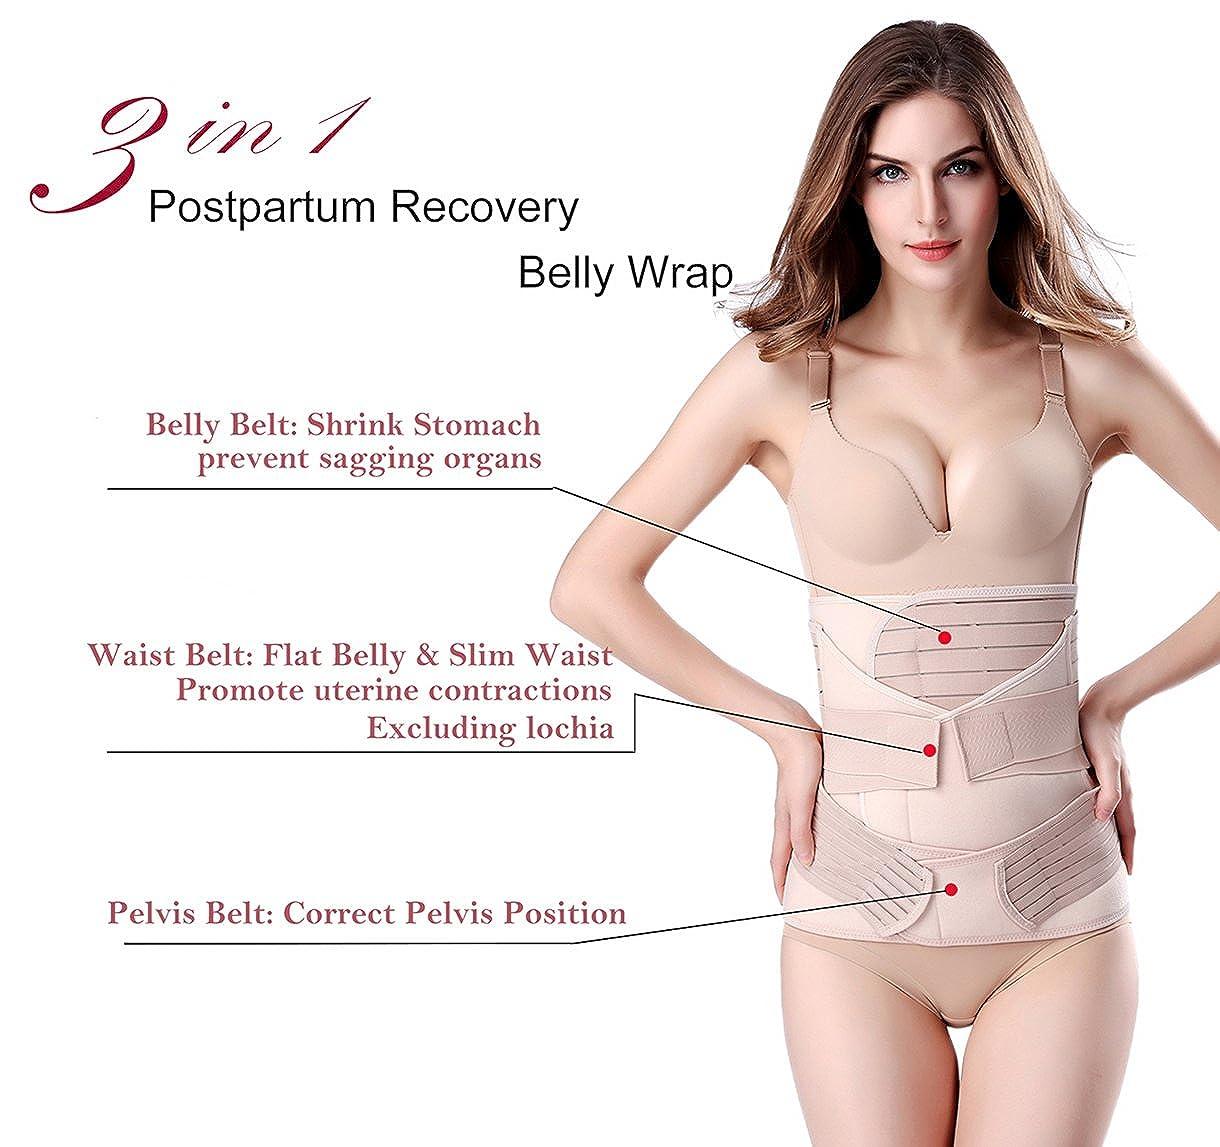 1c7ccdac89 Amazon.com  ChongErfei 3 in 1 Postpartum Support Recovery Belly Wrap Waist Pelvis  Belt Body Shaper Postnatal Shapewear  Clothing